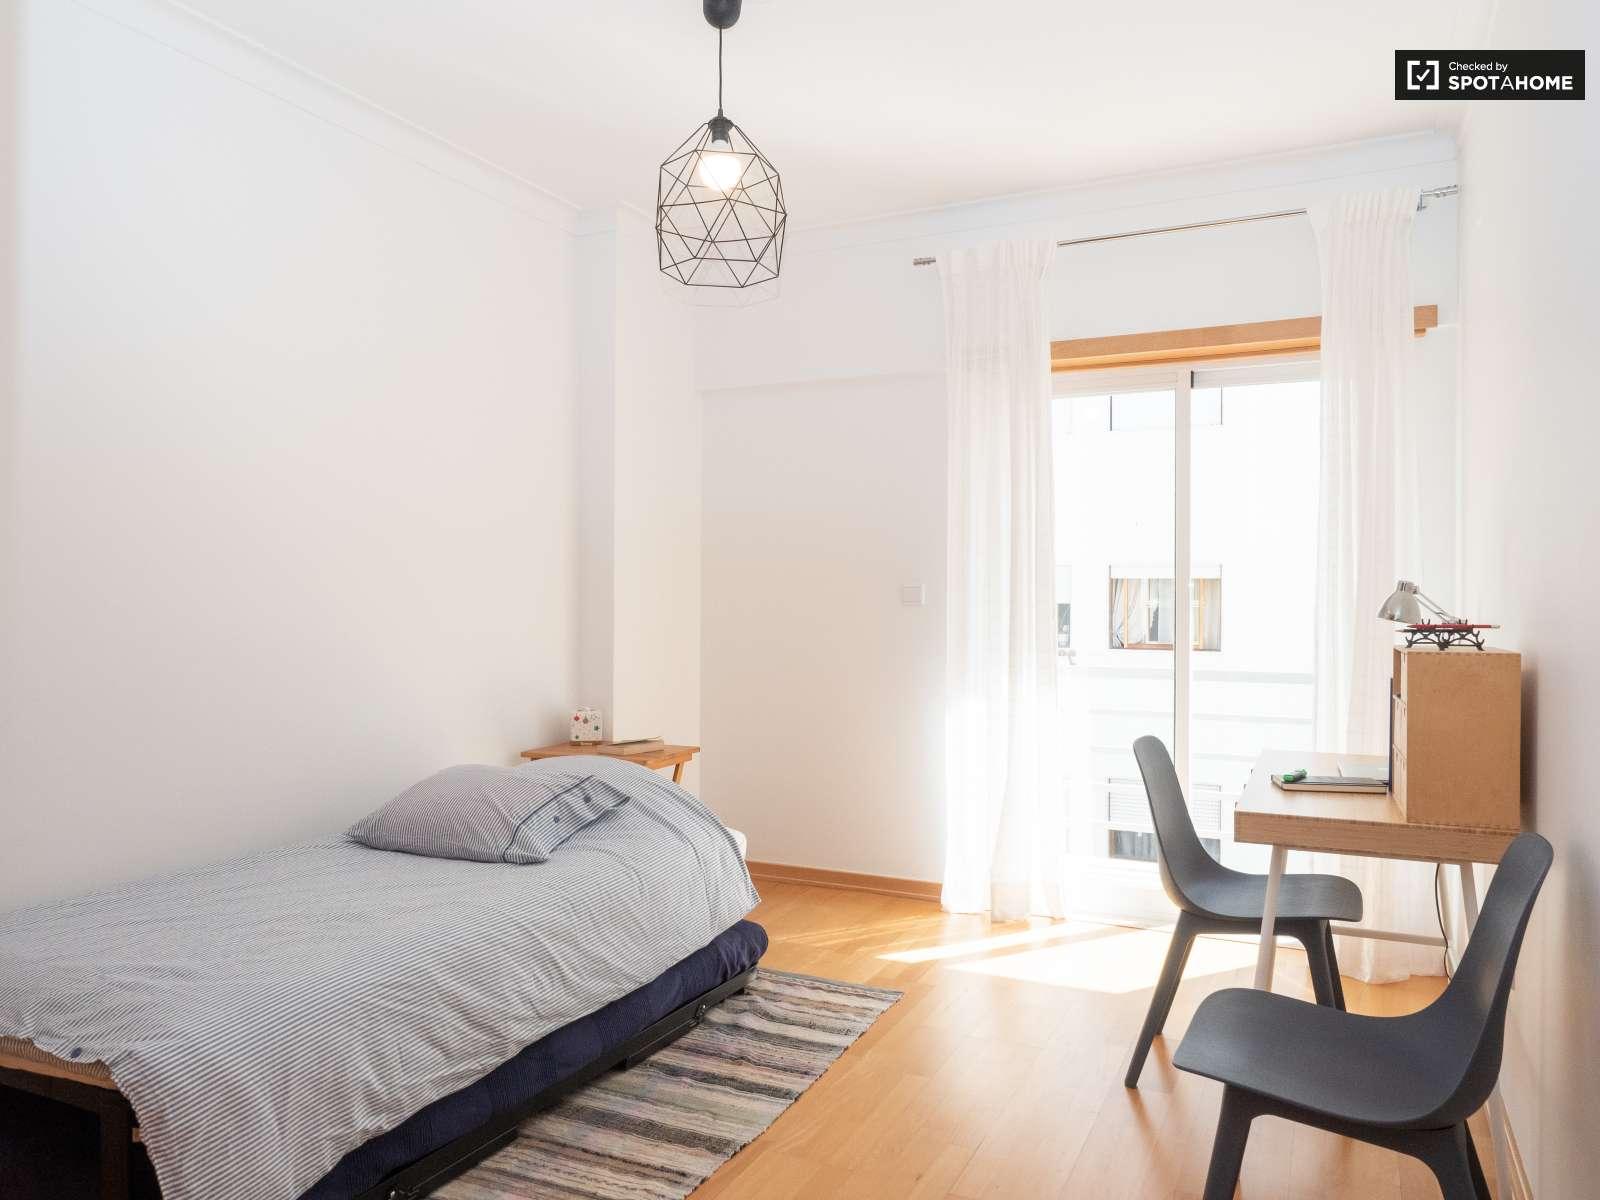 Single Bed in Sunny rooms for rent in flatshare near beach in Costa da Caparica